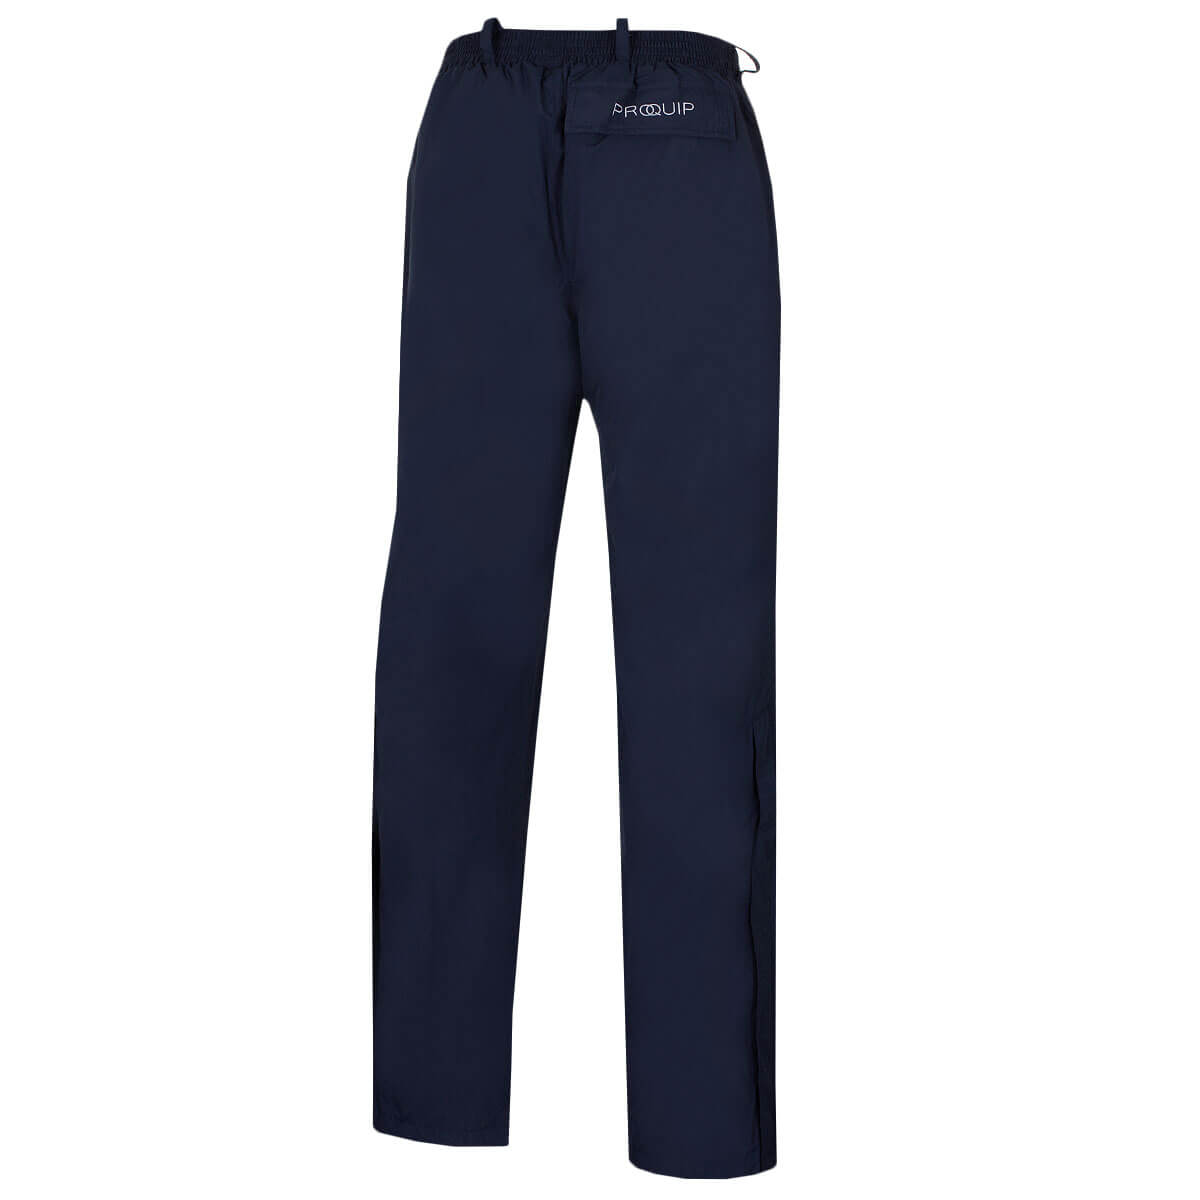 Proquip Golf Mens Waterproof Trousers  - Navy